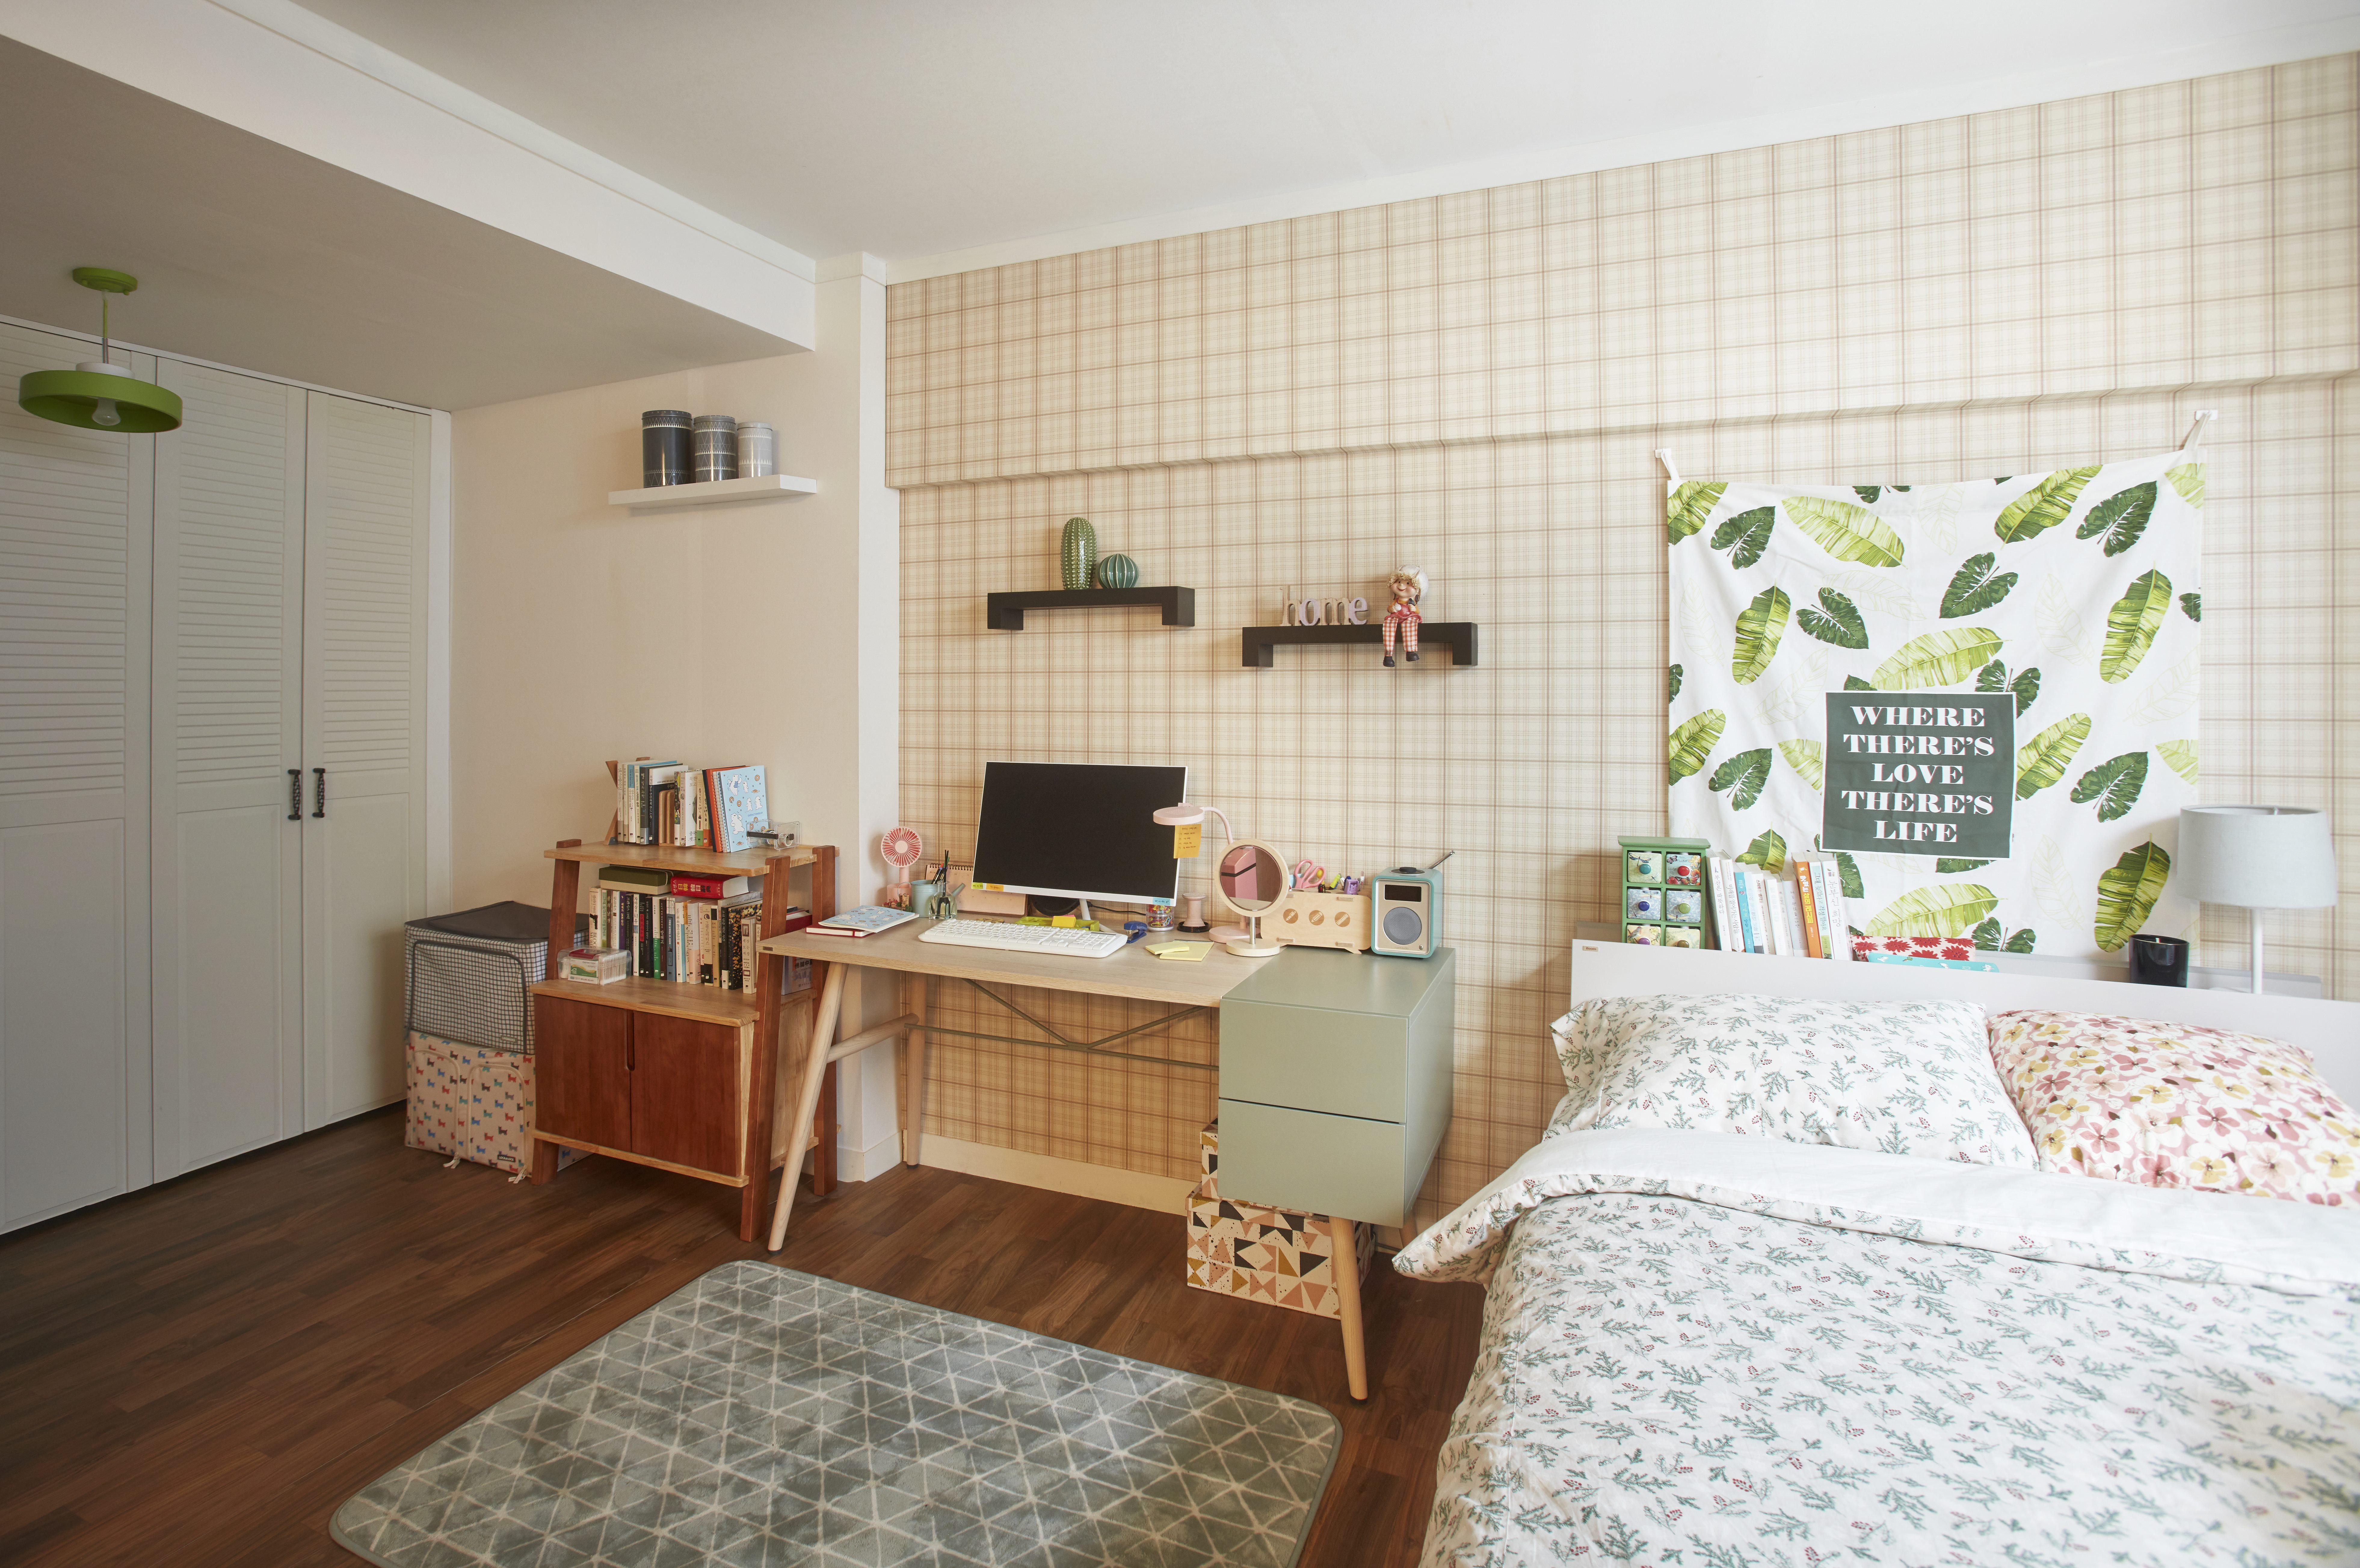 K Pop Furniture Decor Ideas To Customize Your Room Like Kim